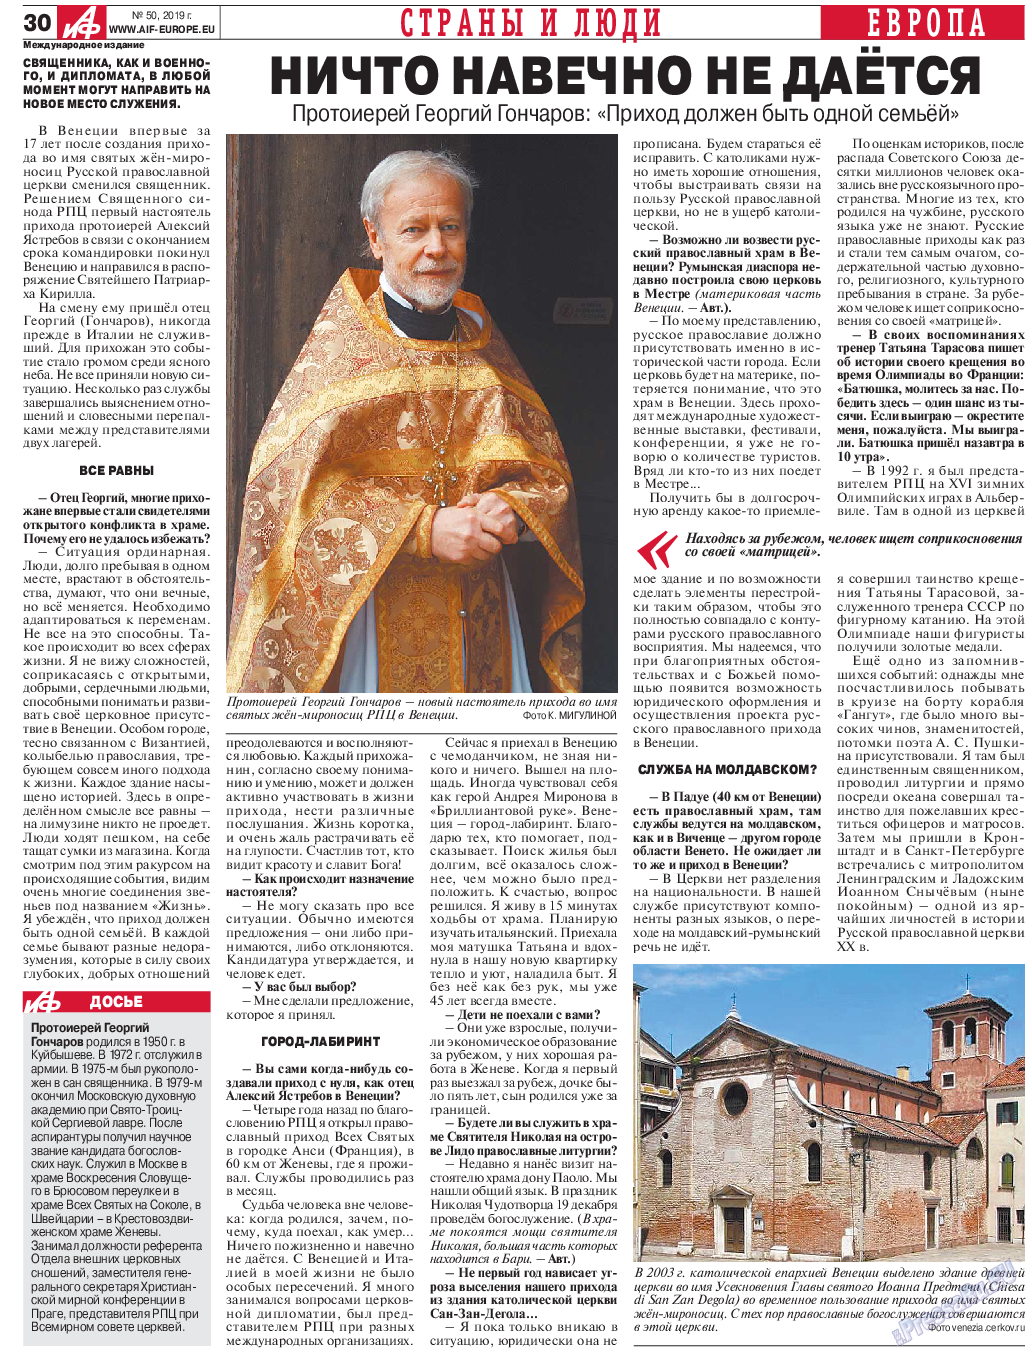 Аргументы и факты Европа (газета). 2019 год, номер 50, стр. 30